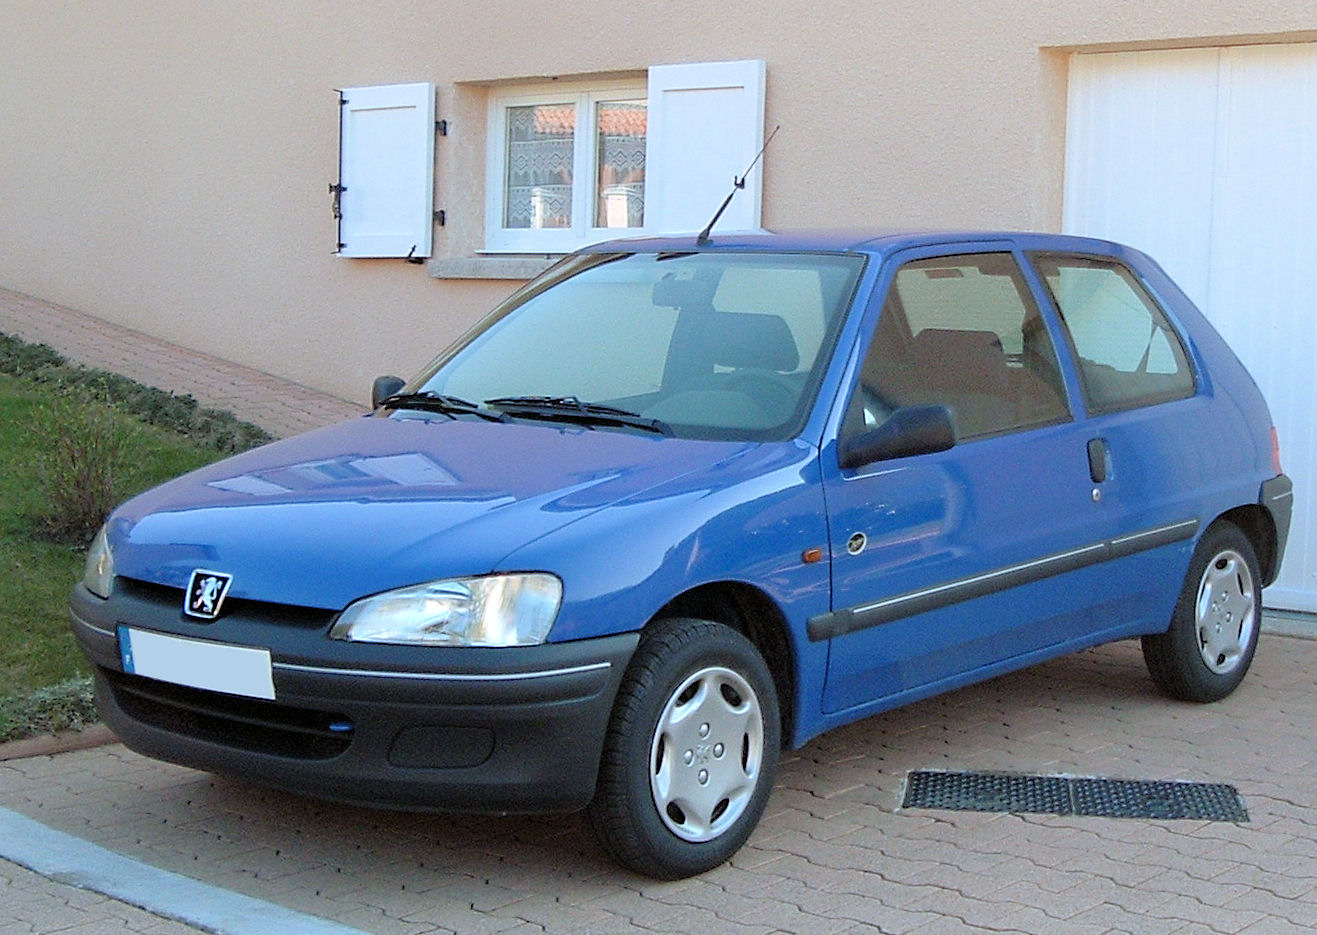 PEUGEOT 106 blue